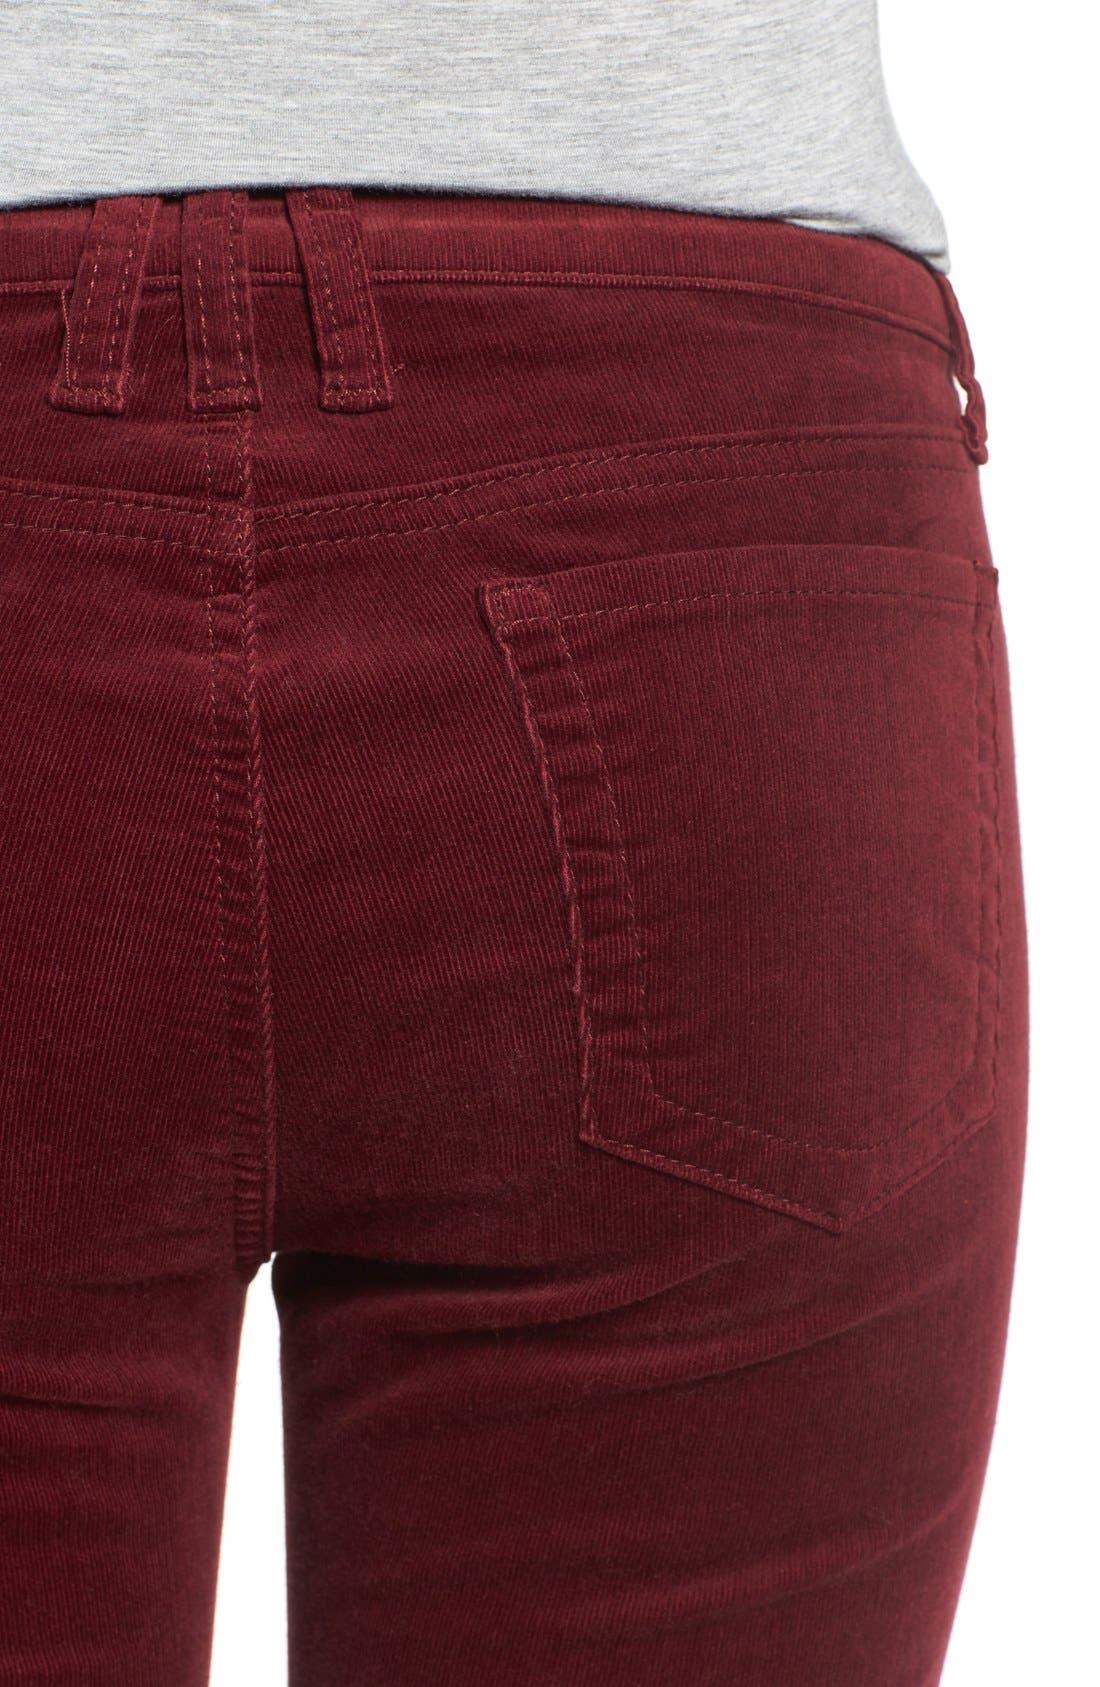 'Diana' Stretch Corduroy Skinny Pants,                             Alternate thumbnail 297, color,